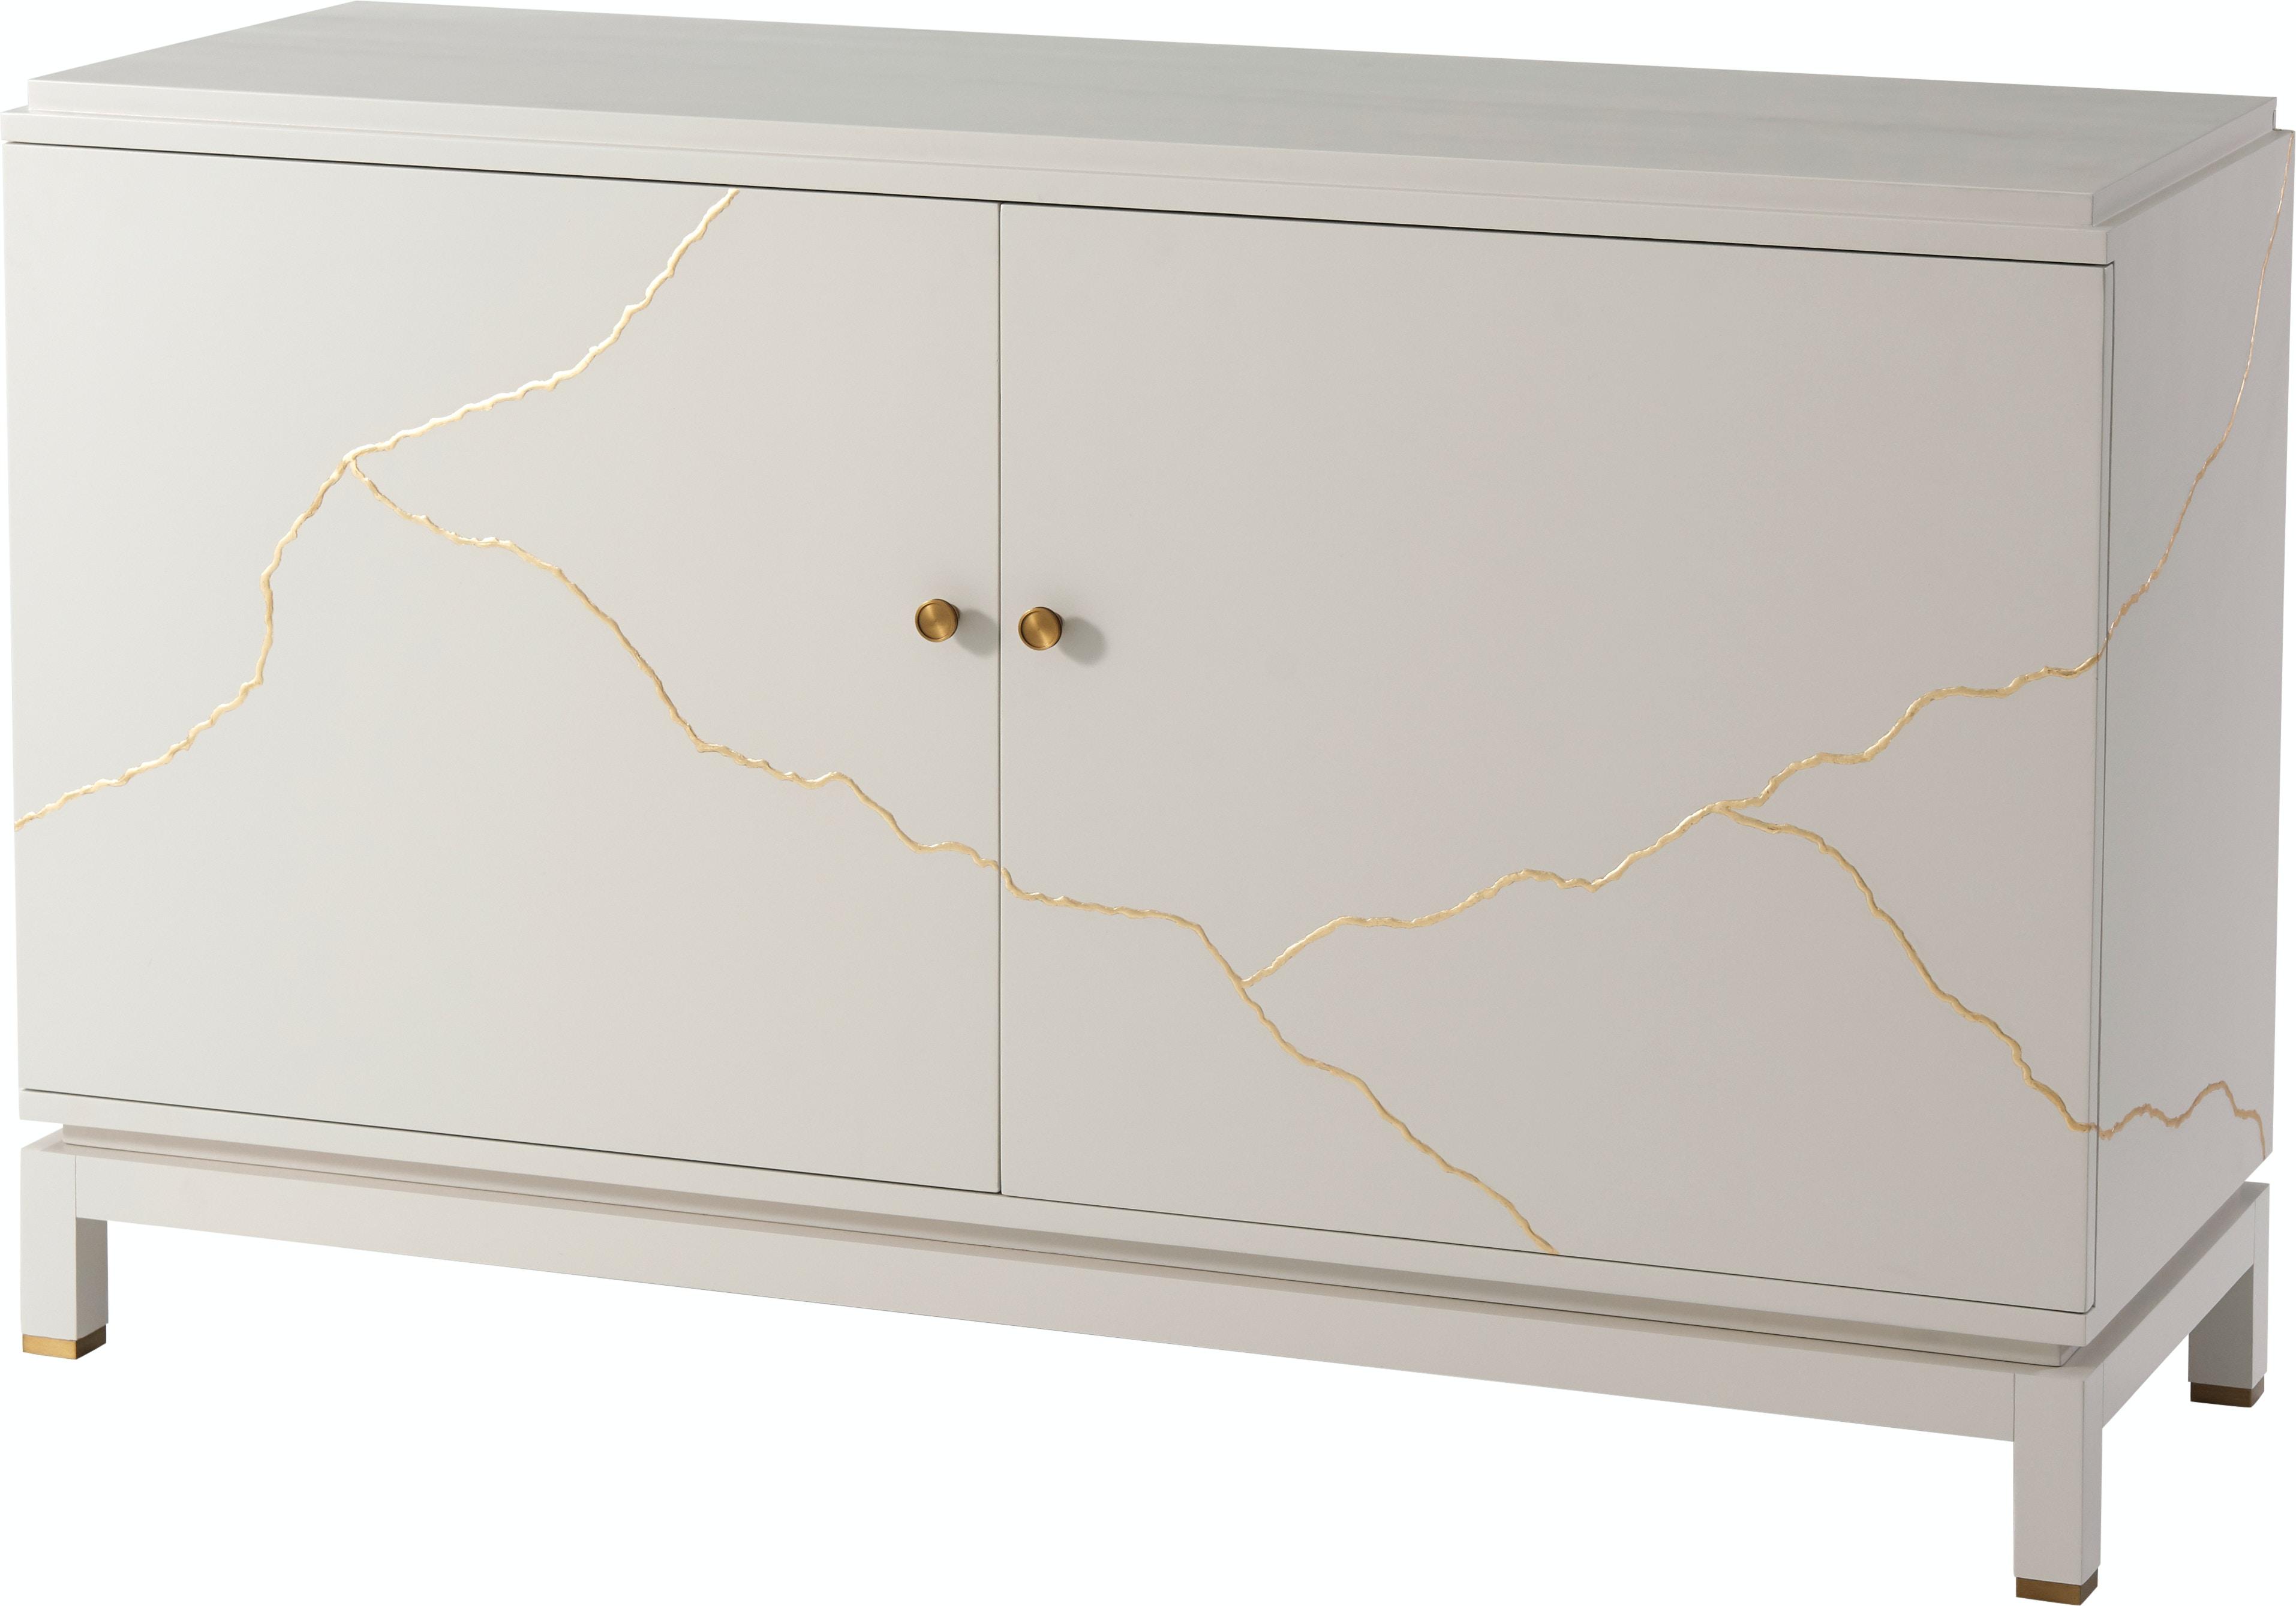 Marloe Decorative Cabinet Thac61025